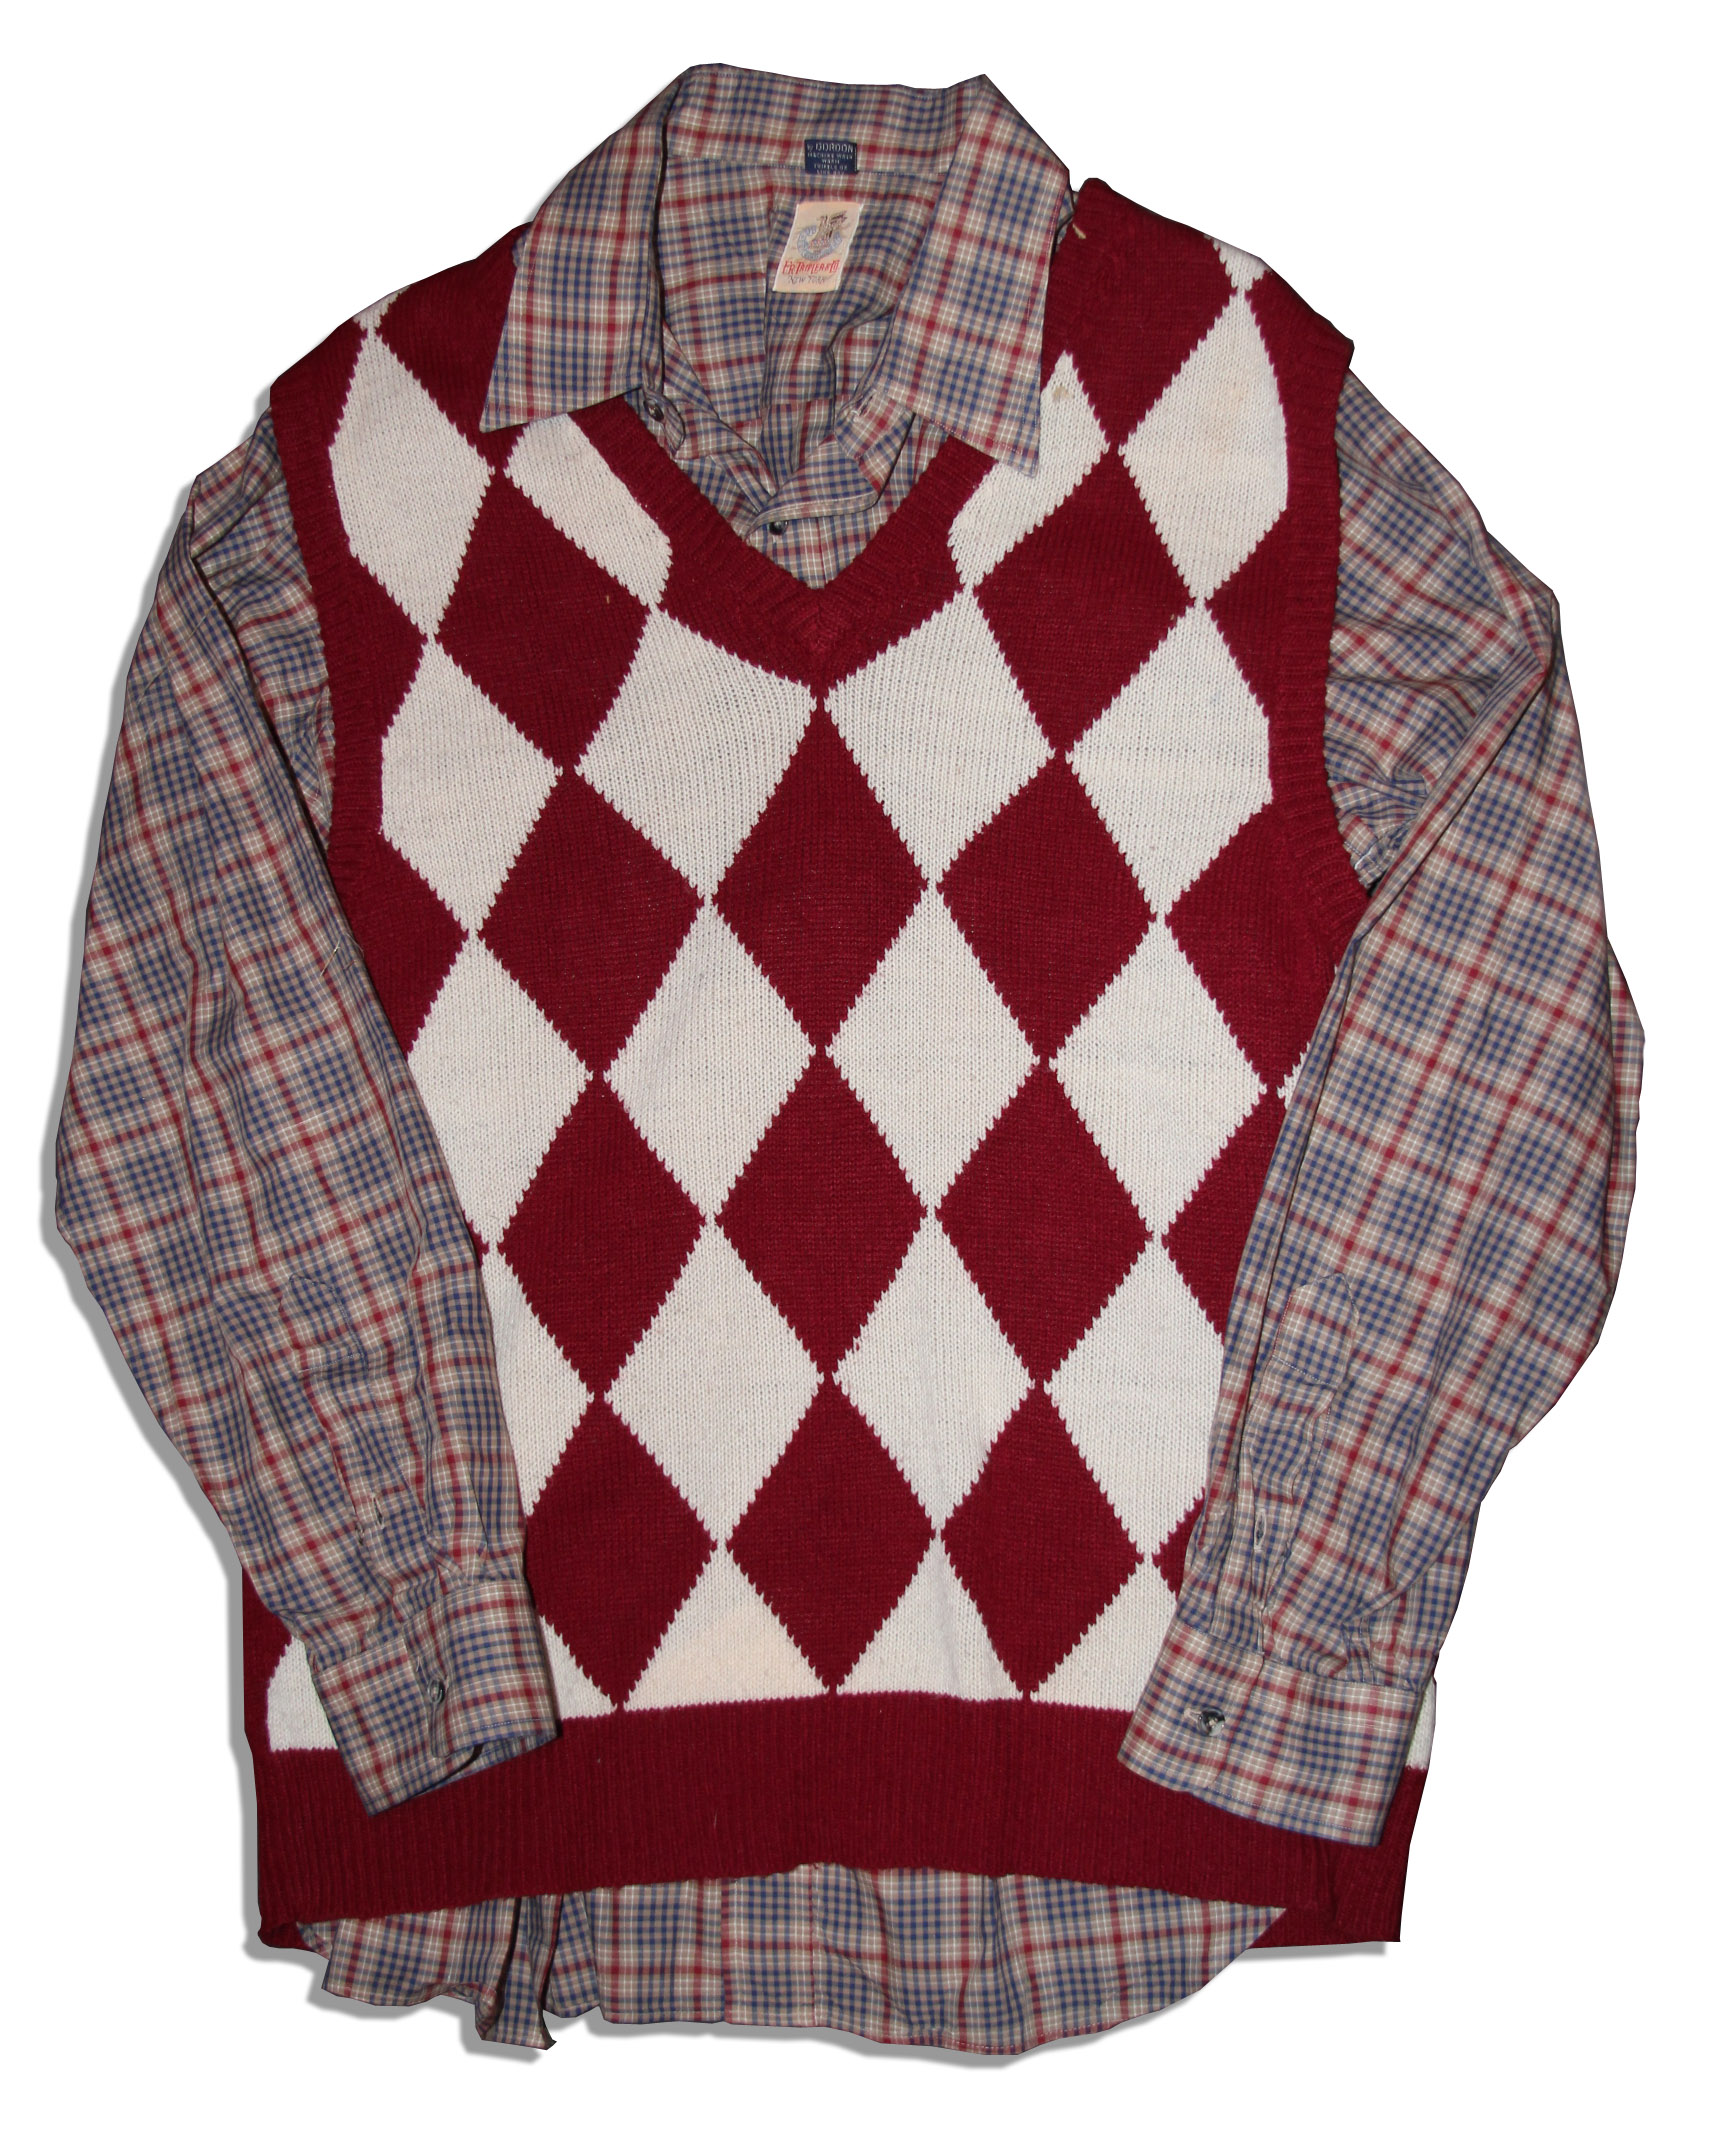 Plaid Sweater Vests - Gray Cardigan Sweater